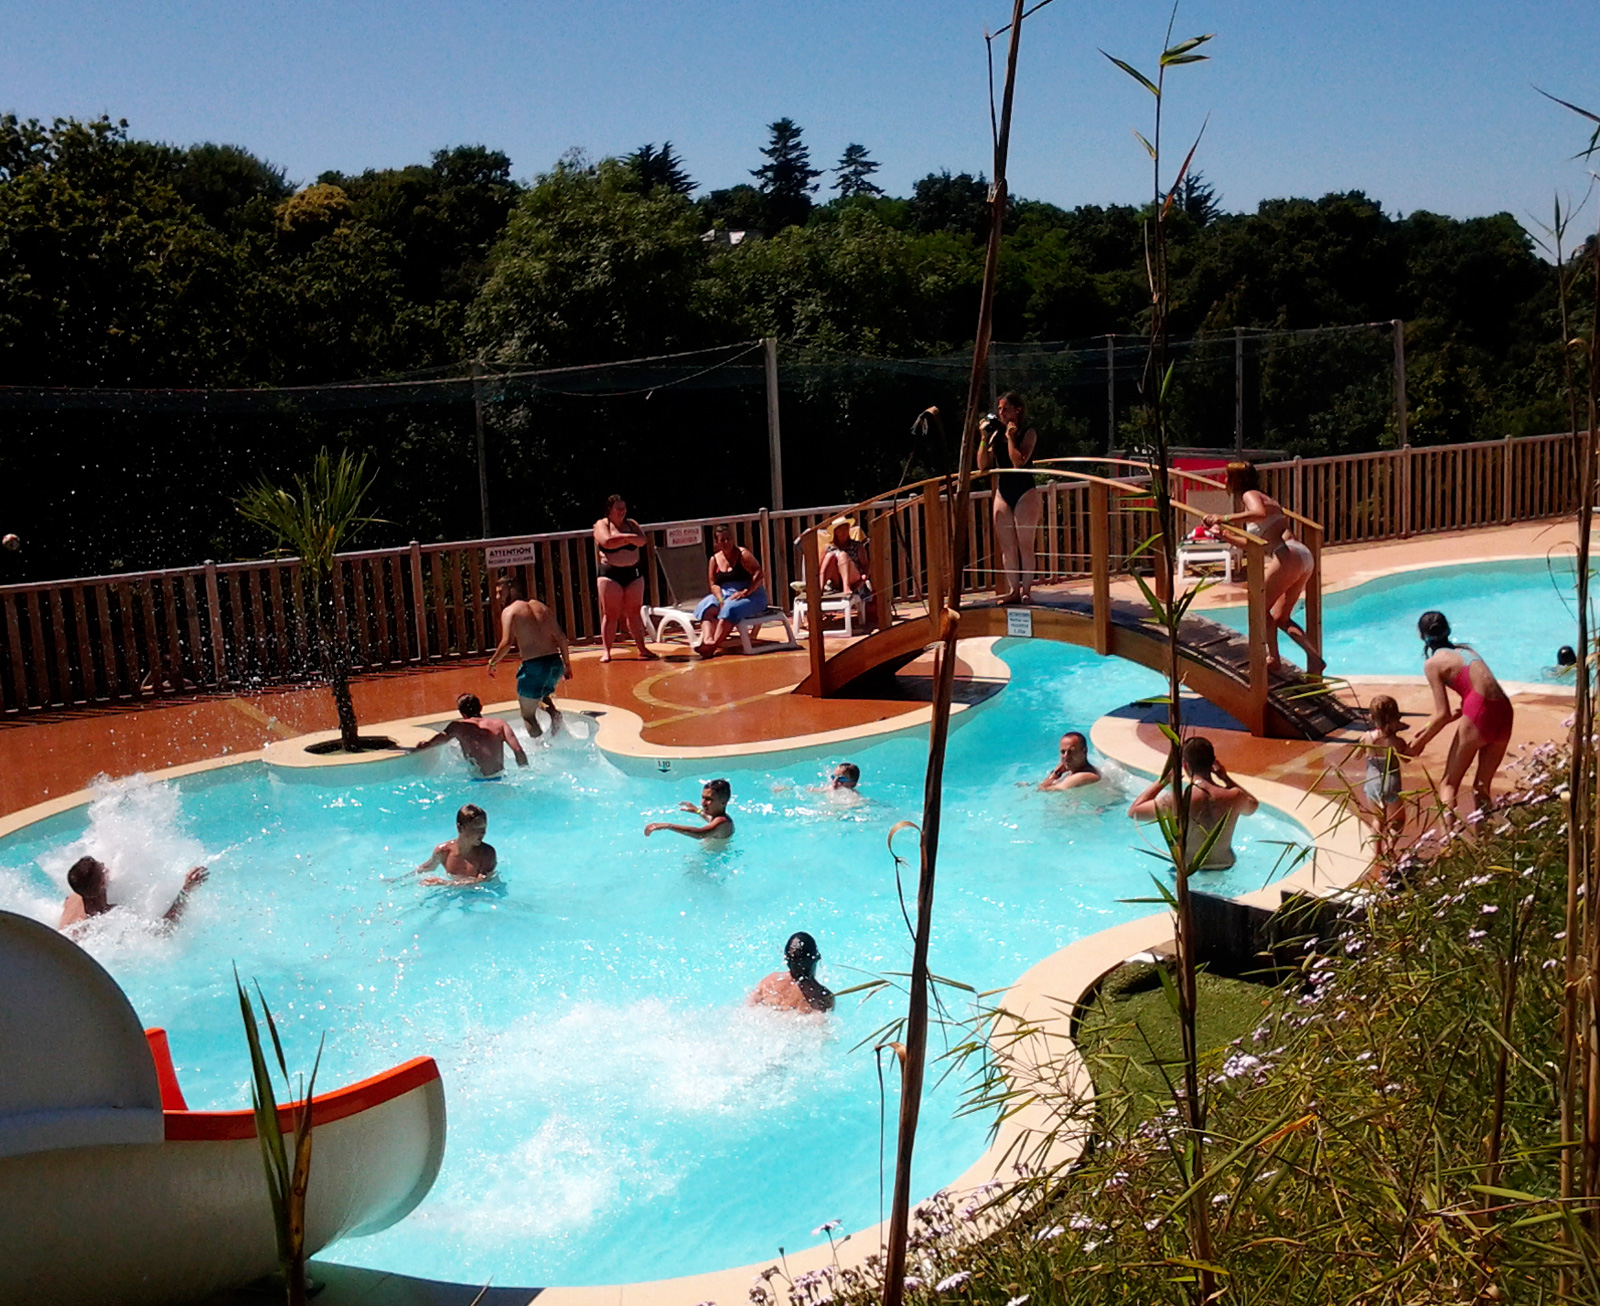 Camping en bretagne avec piscine couverte camping c tes for Camping queyras avec piscine